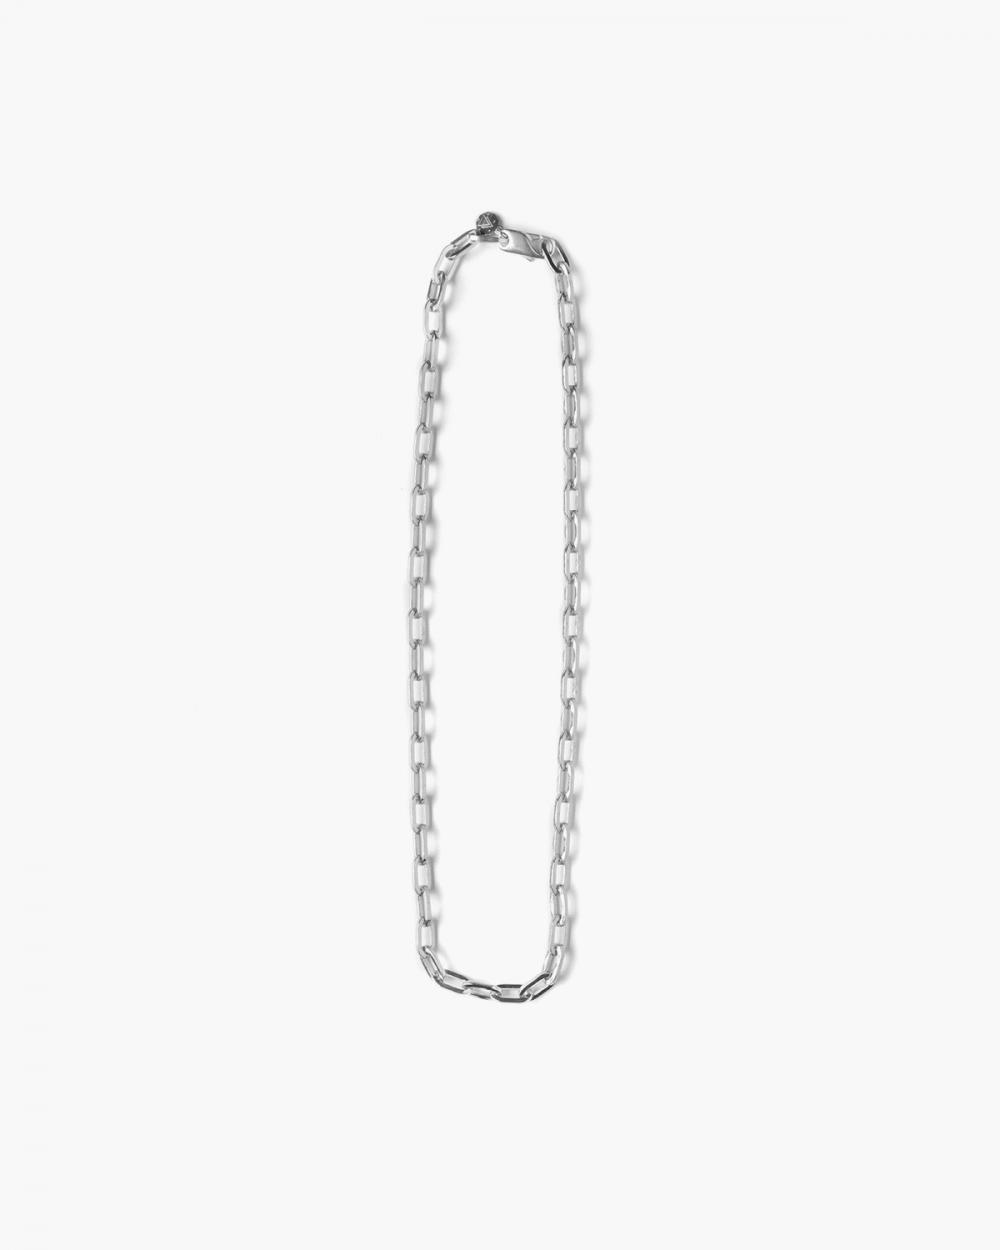 Necklaces SILVER MEDIUM OVAL BOX CHAIN NECKLACE NOVE25